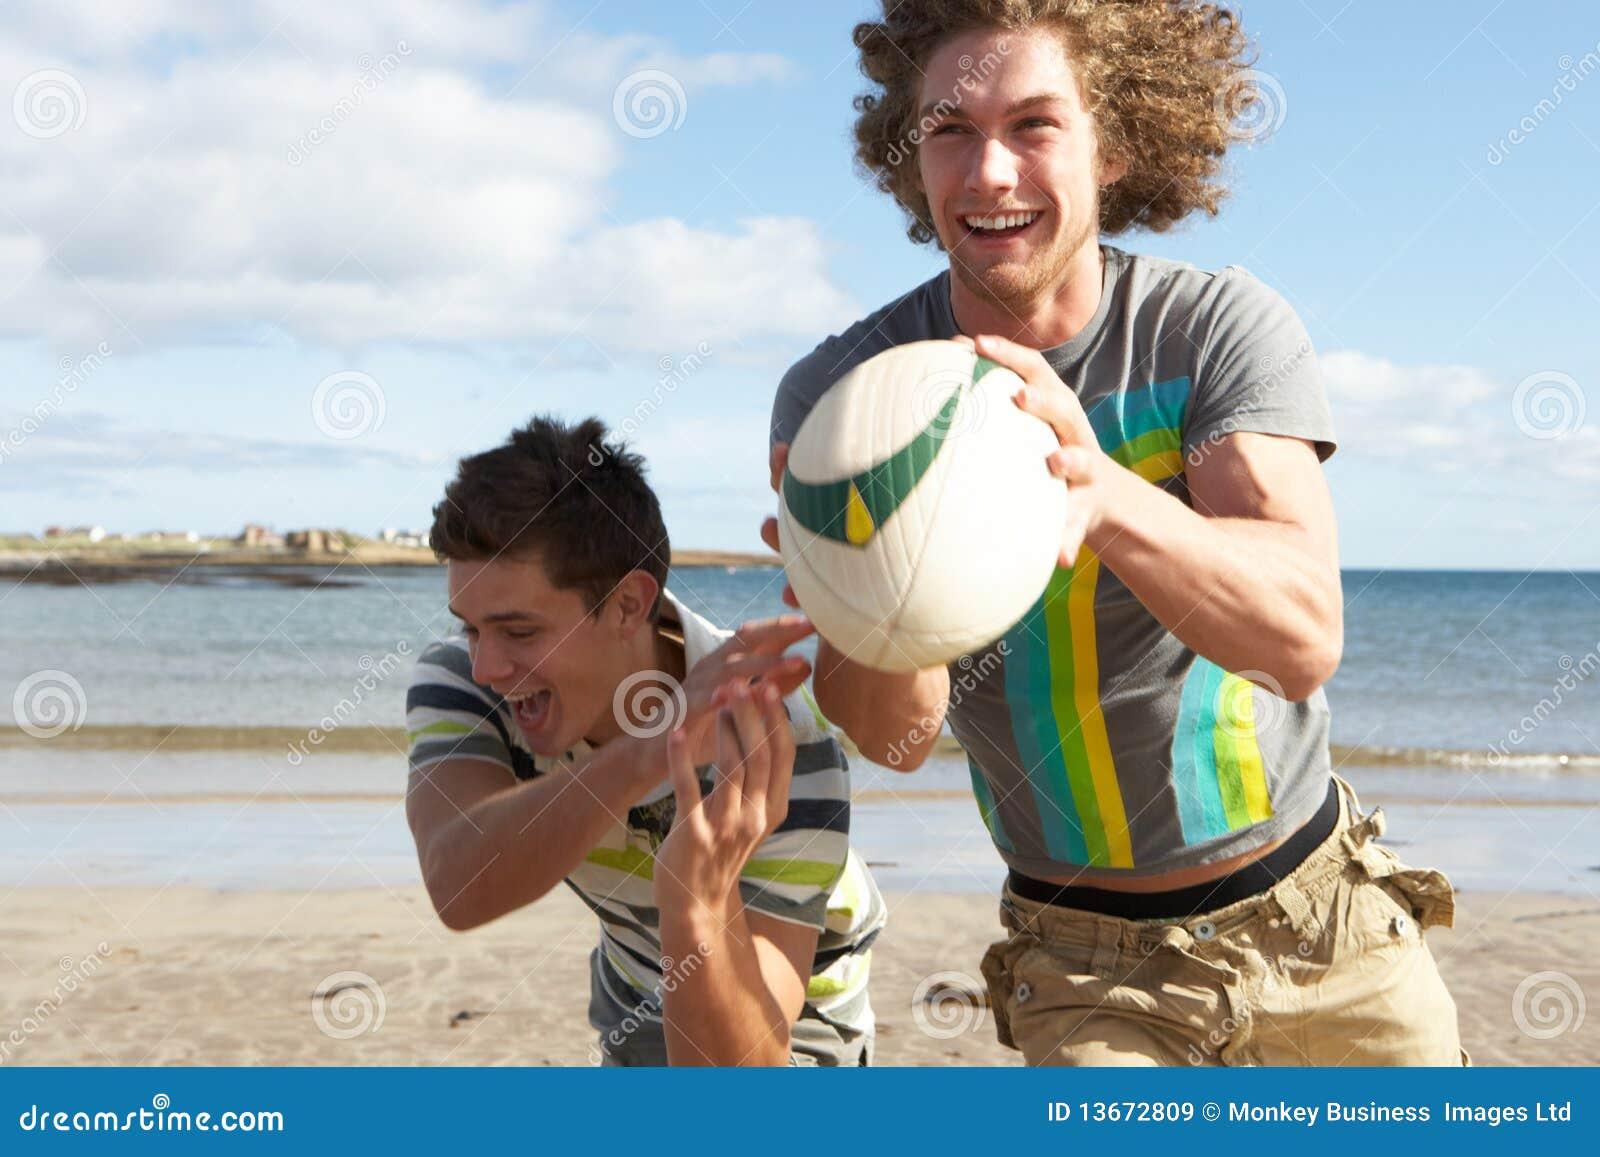 naked teen men on the beach